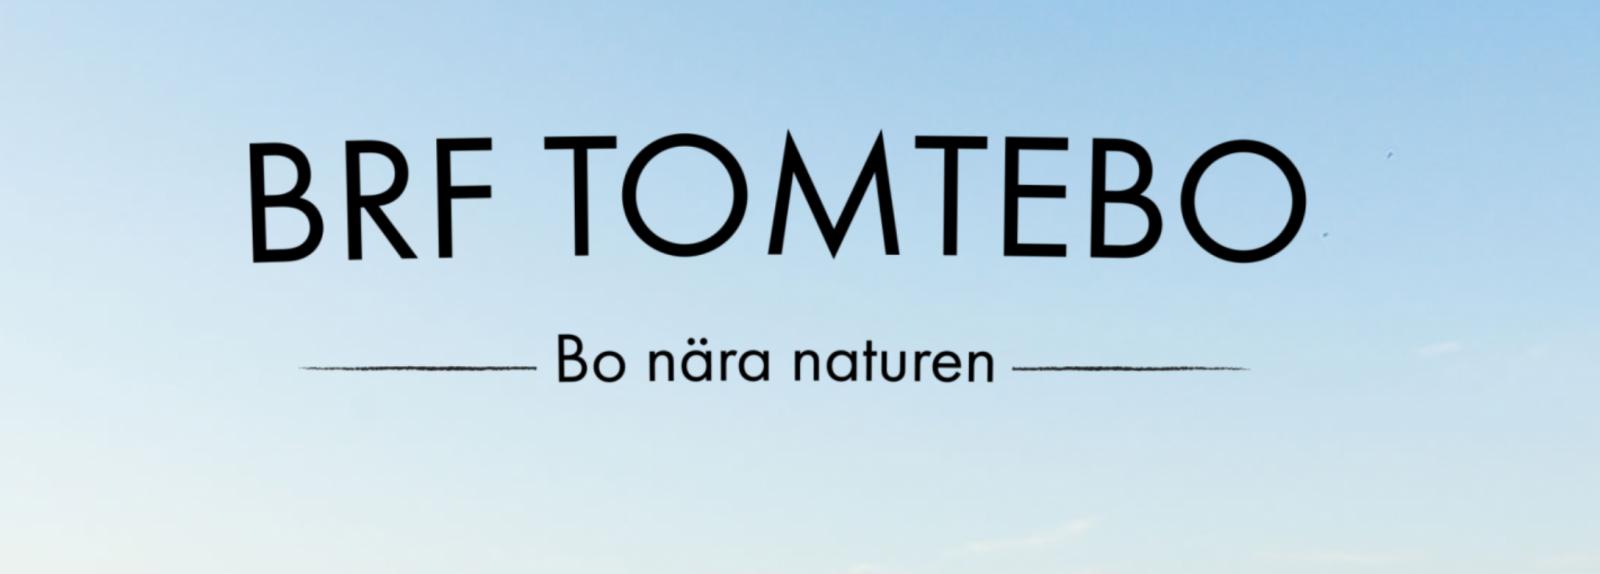 BRF Tomtebo